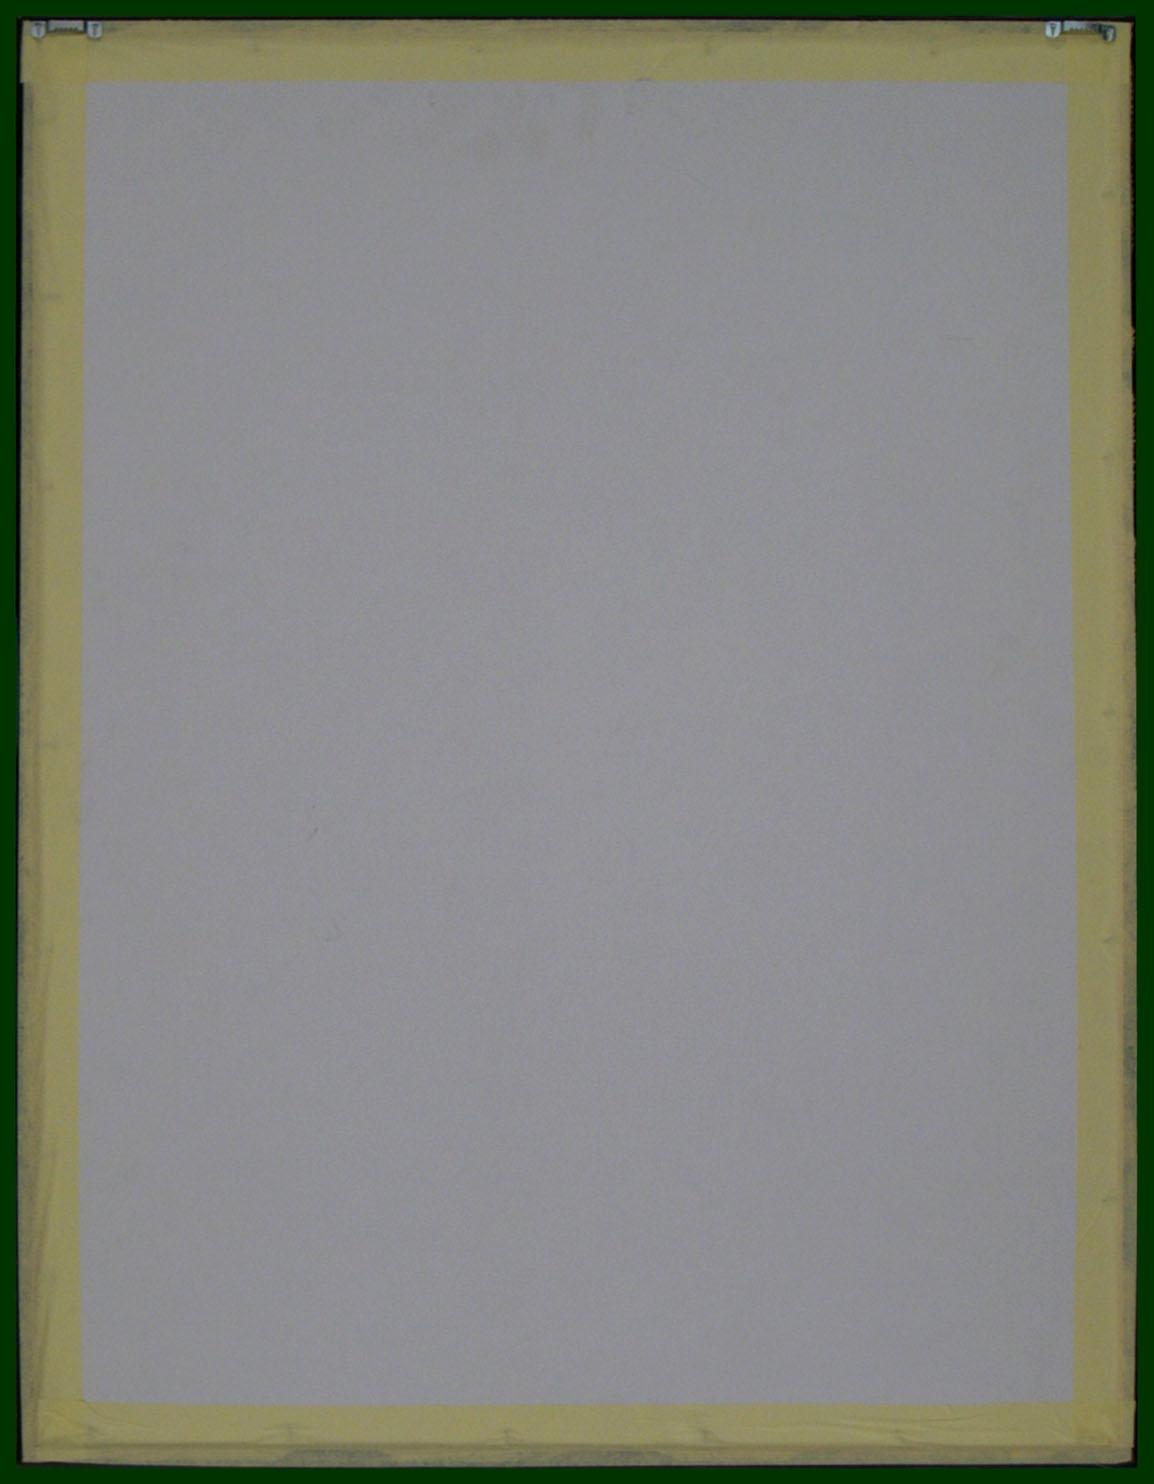 029-003hat.JPG (1154×1484)